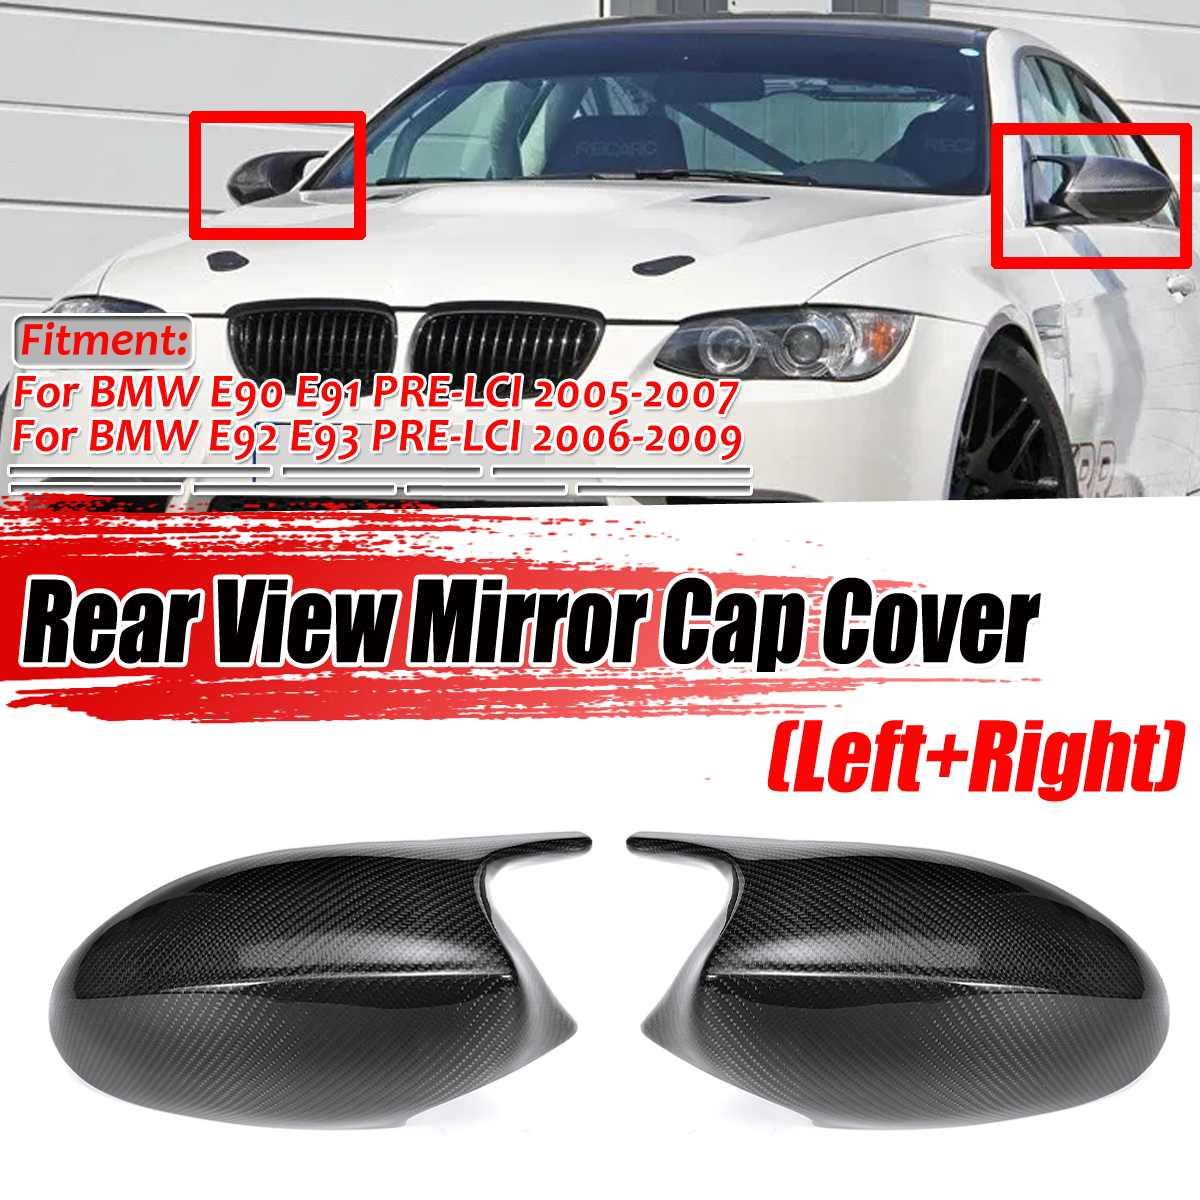 2 tapas de la cubierta del espejo E90 de la puerta del lado de la fibra de carbono del estilo M3 Real para BMW E90 E91 2005-2007 E92 E93 2006-2009 E81 E82 E88